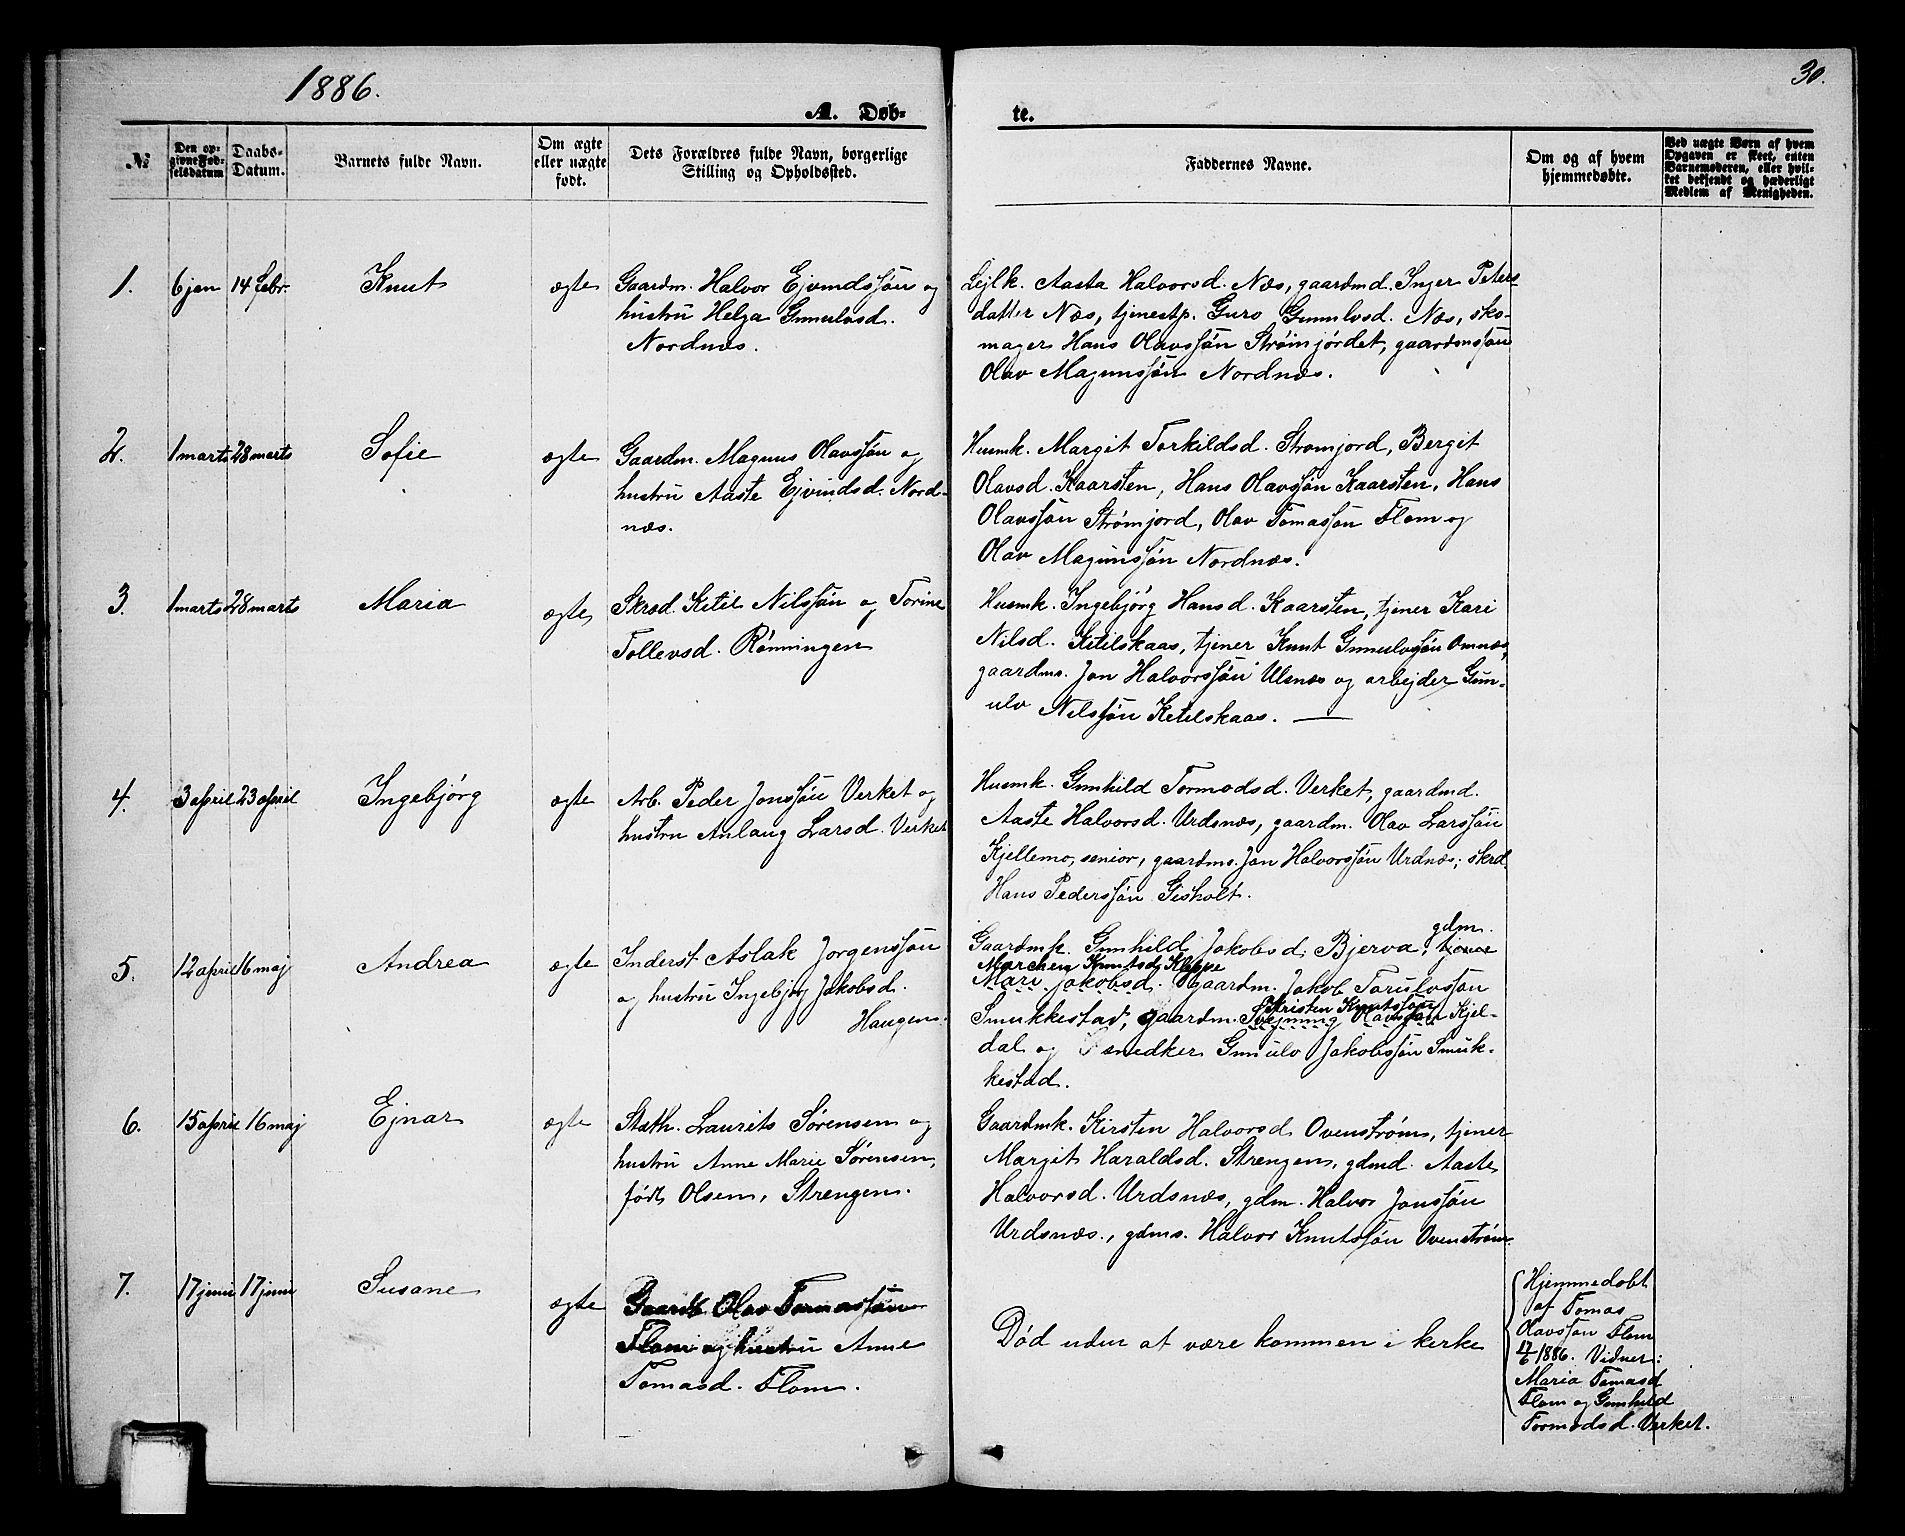 SAKO, Lunde kirkebøker, G/Gb/L0001: Klokkerbok nr. II 1, 1866-1887, s. 30